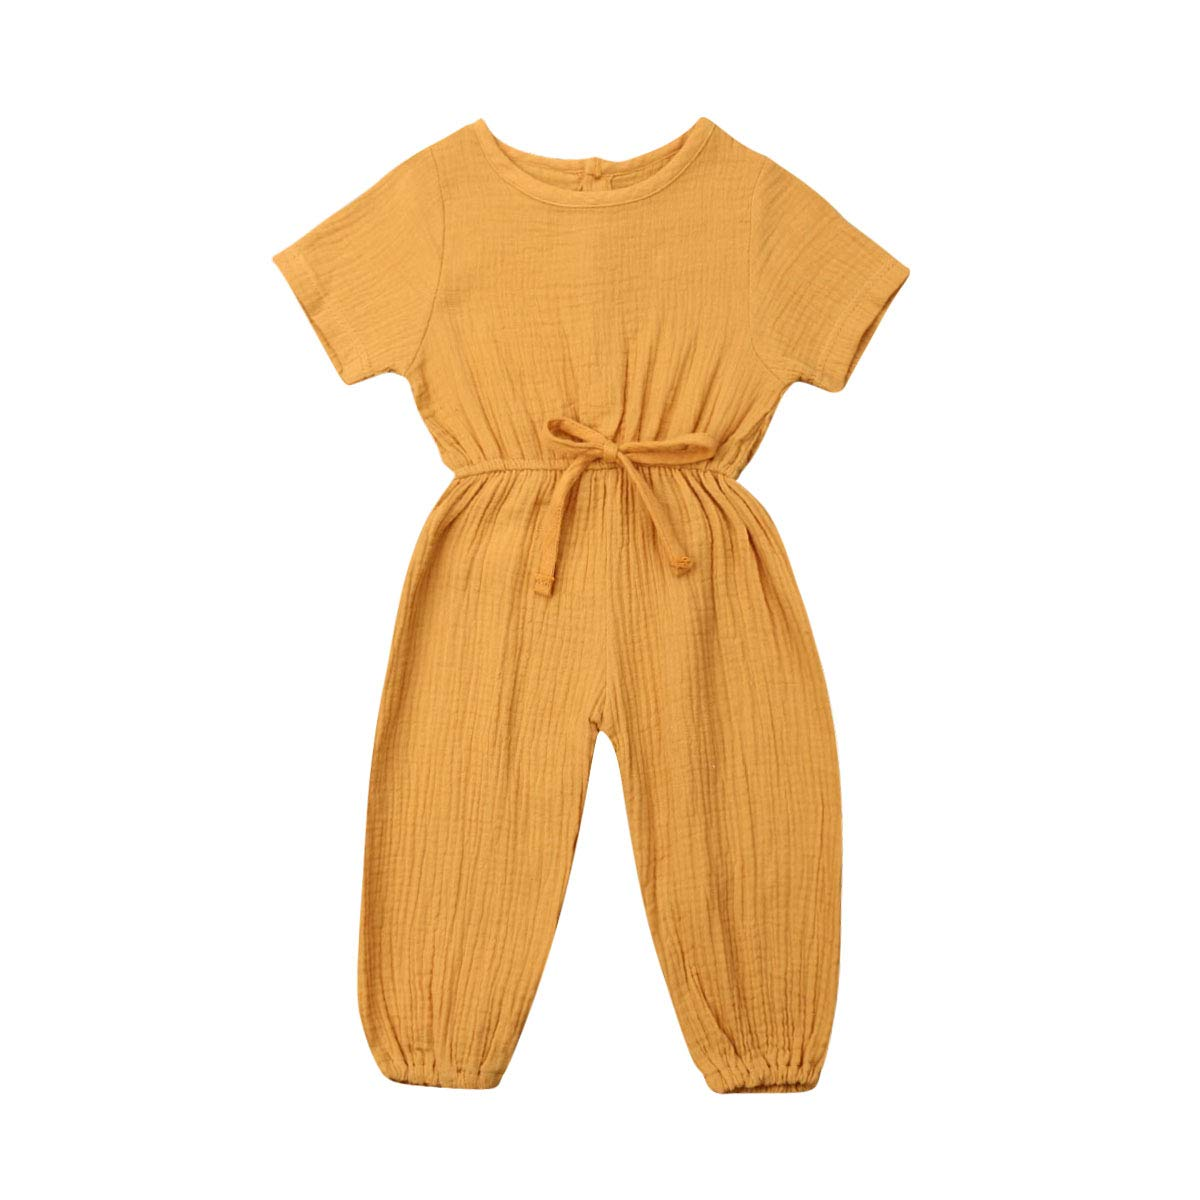 Mubineo Toddler Baby Girl Summer Fall Basic Plain Short Sleeve Cotton Linen Drawstring Romper Jumpsuit